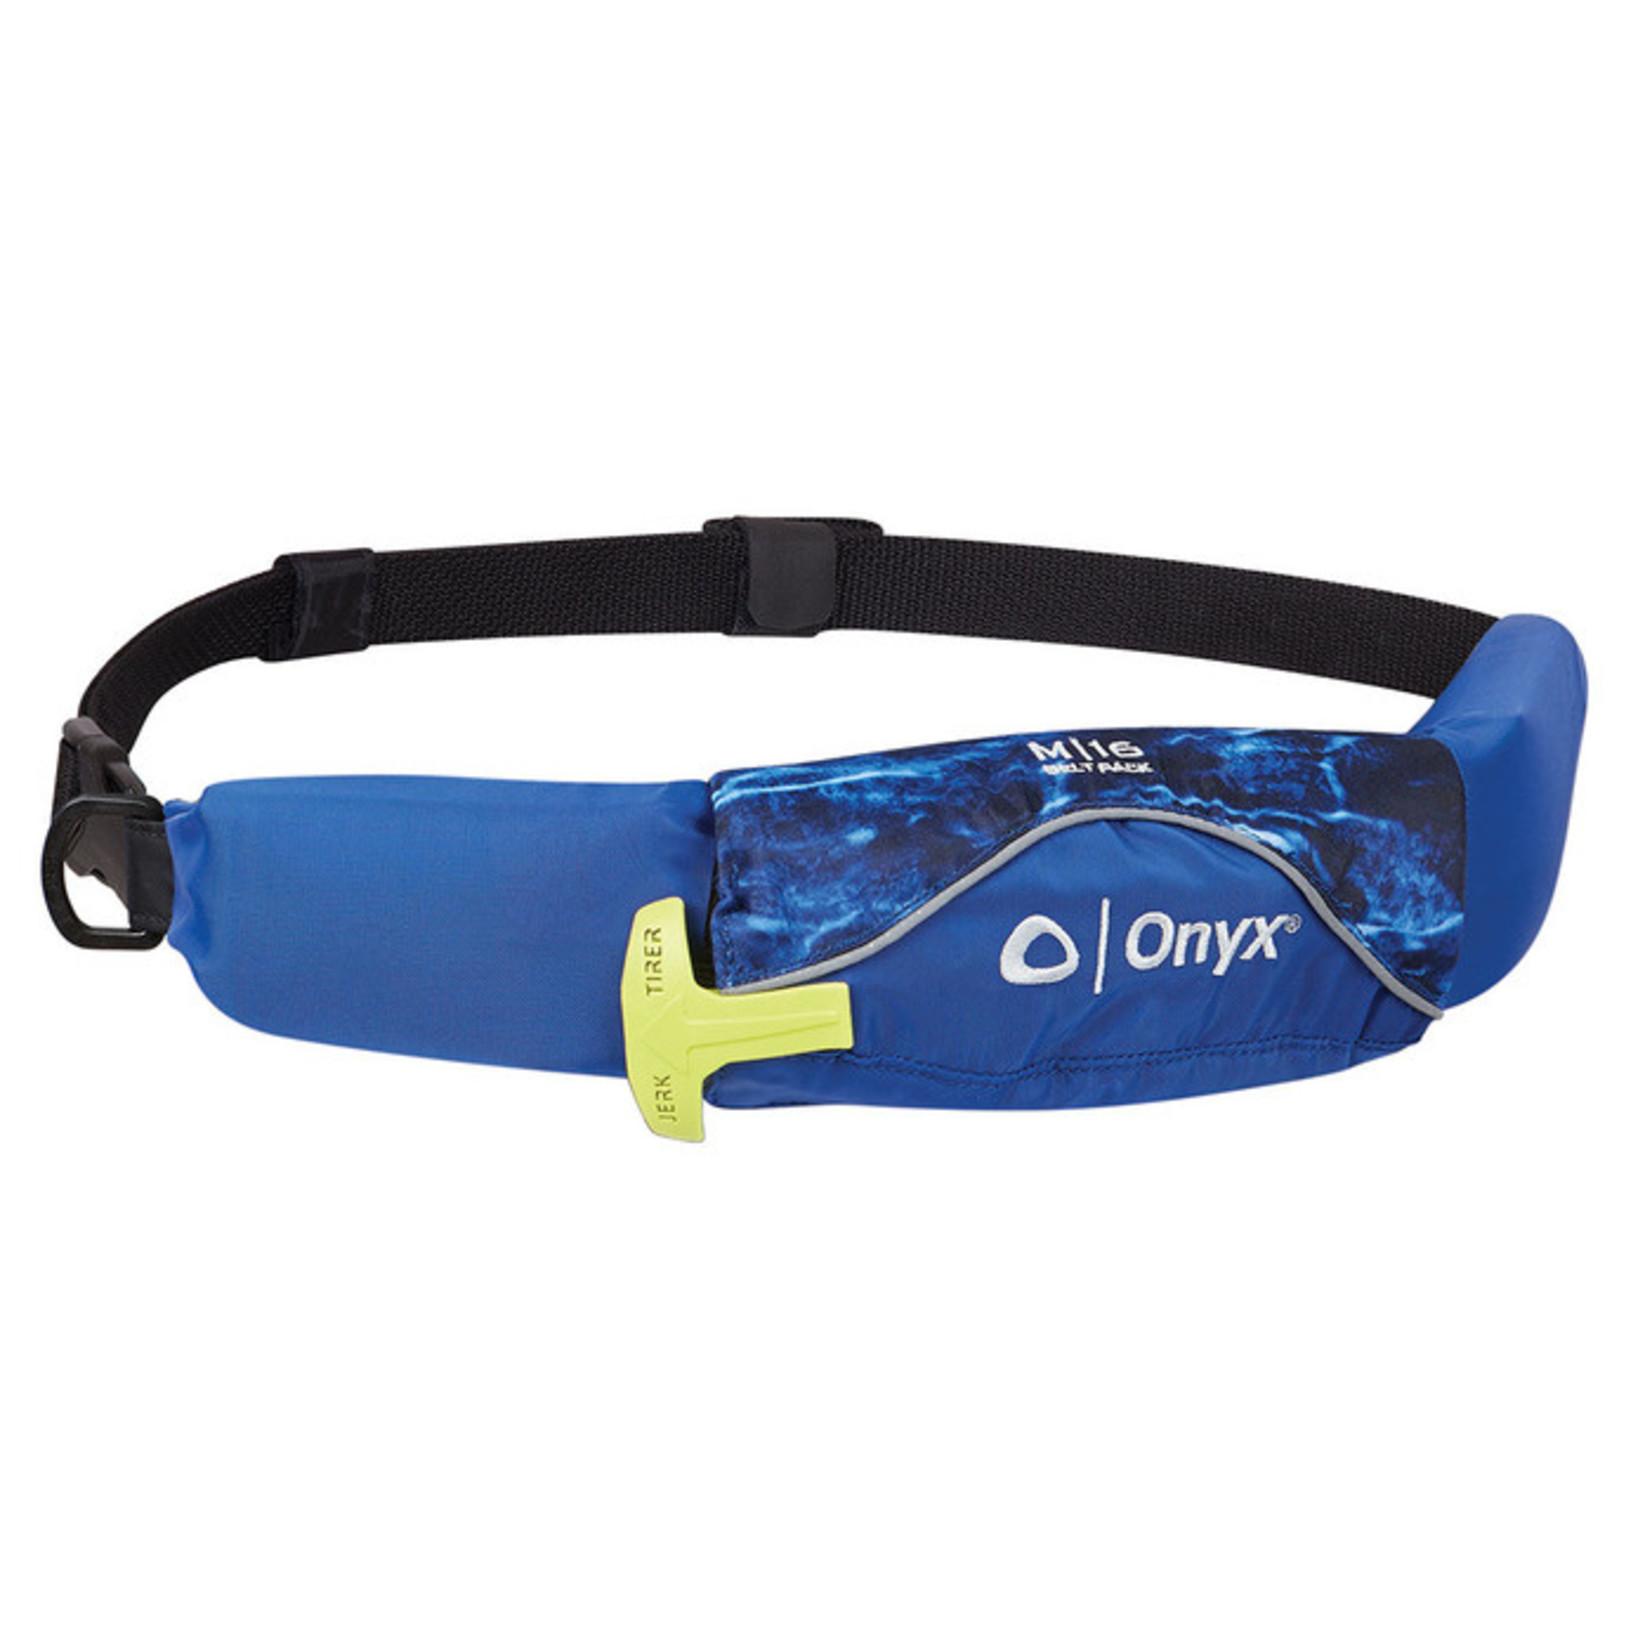 Onyx Onyx M-16 Belt Pack Manual Inflatable Life Jacket (PFD)  -  Elements